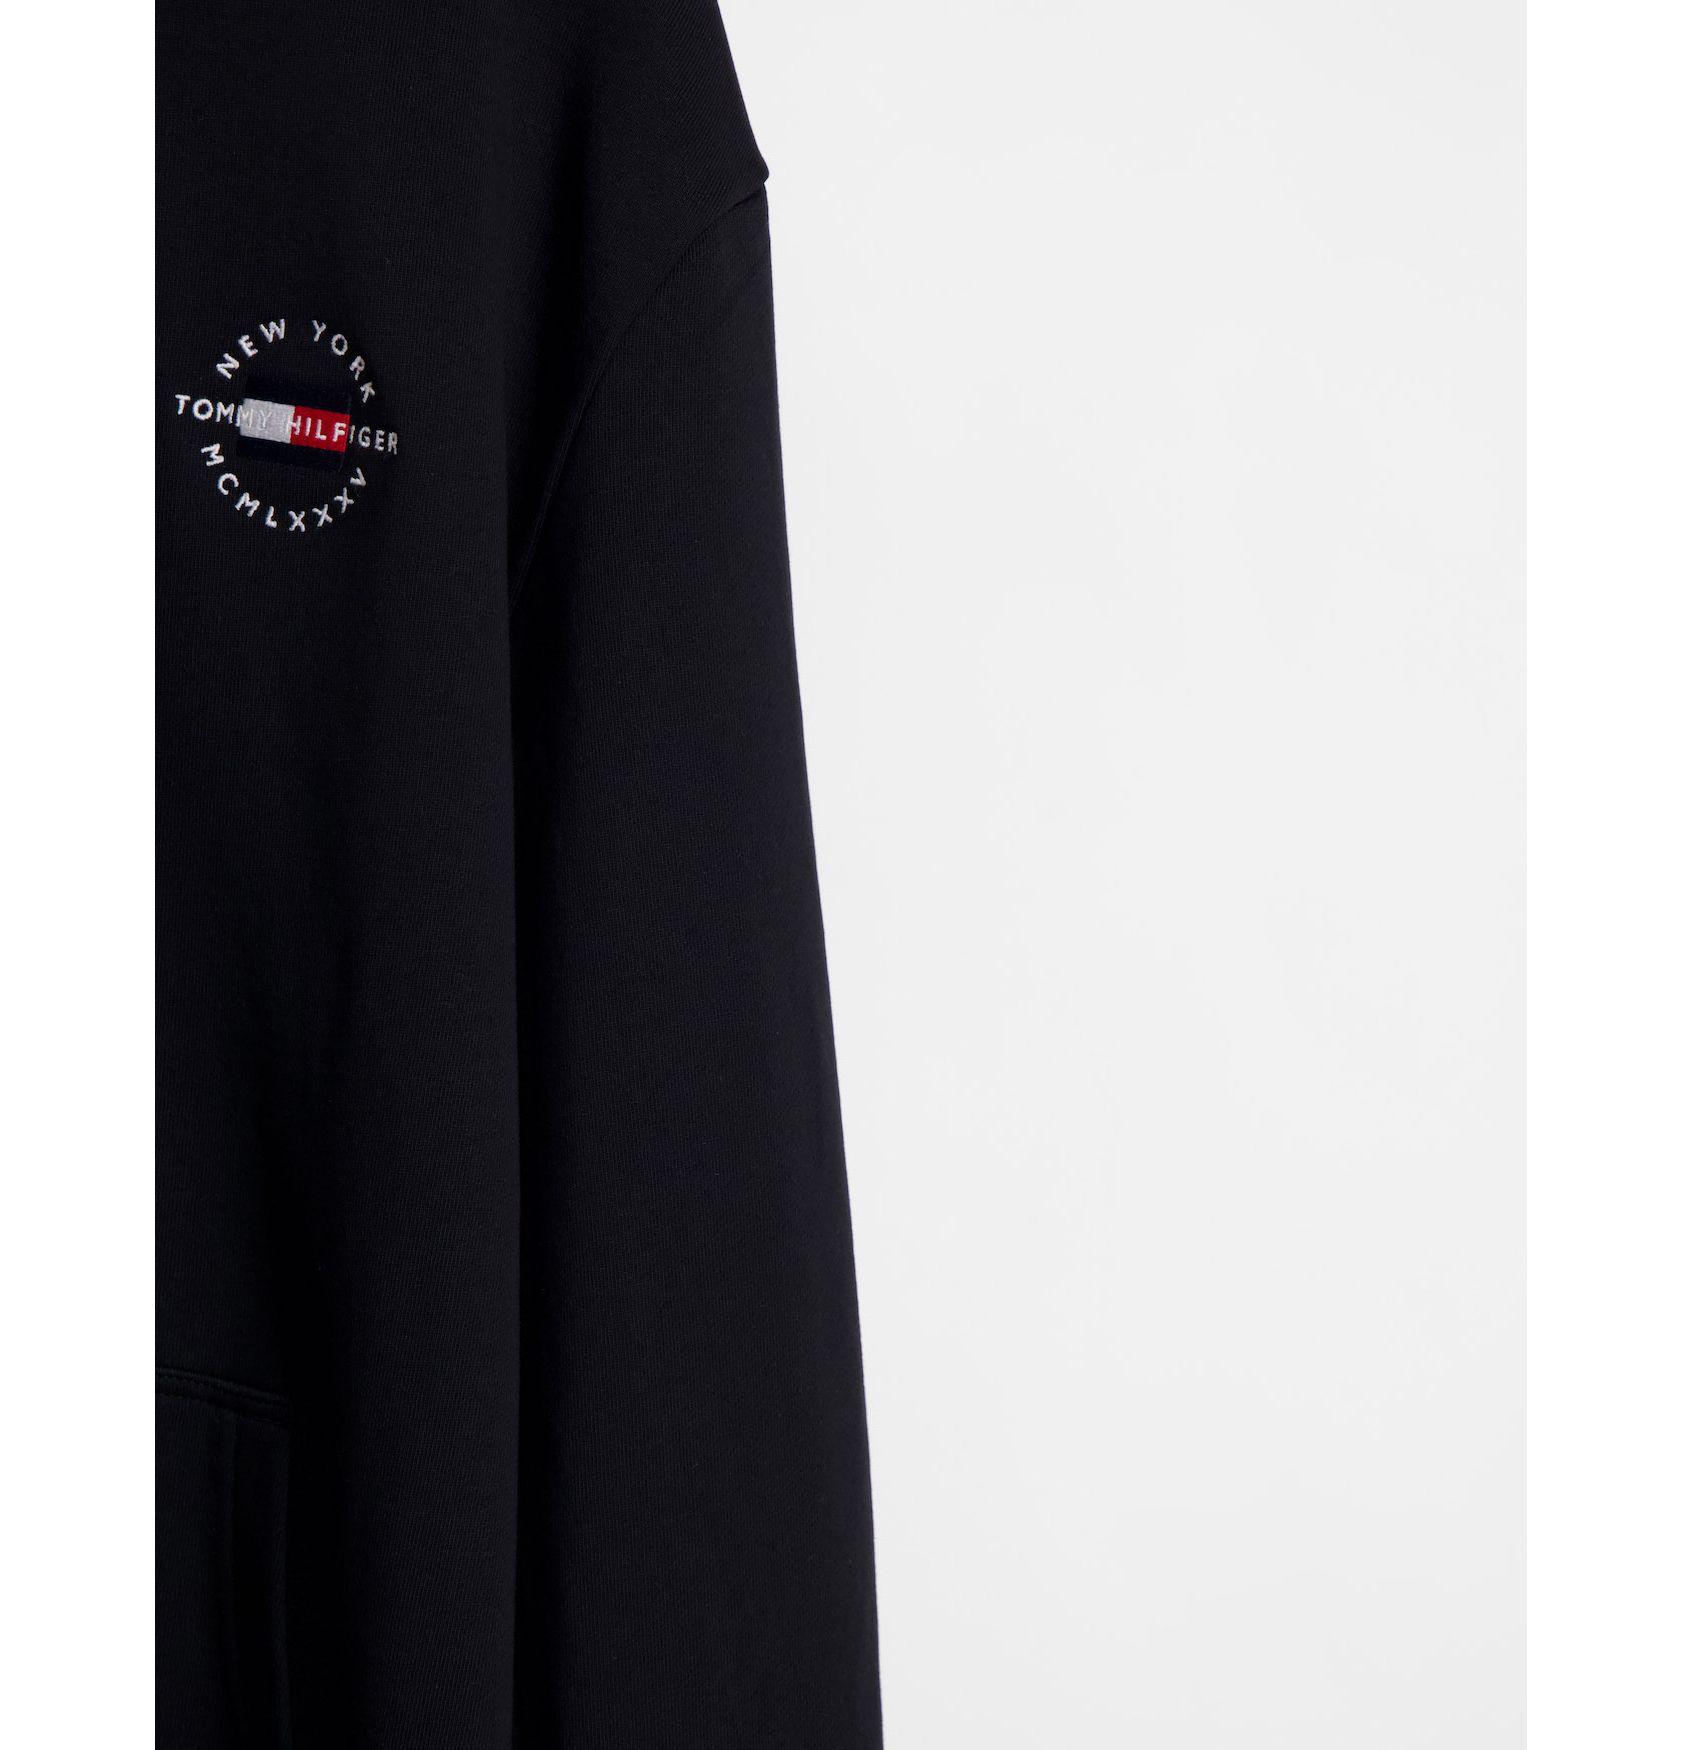 Tommy Hilfiger Big & Tall logo hoodie in black -  Price Checker